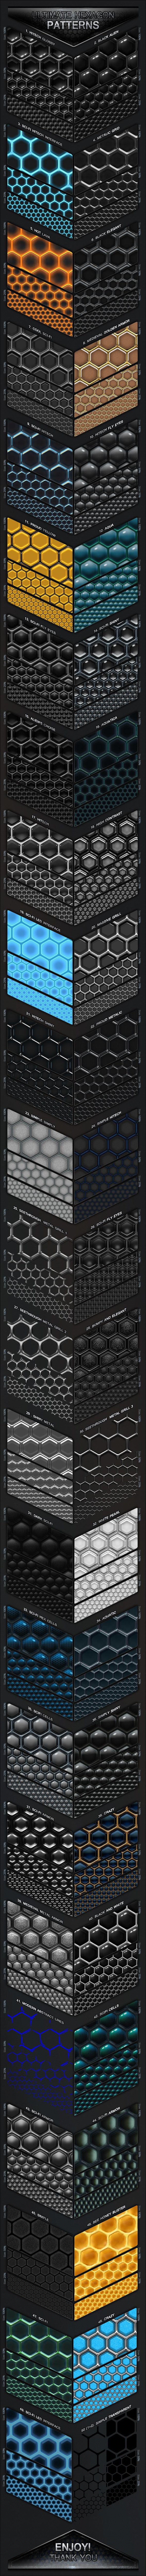 Ultimate Hexagon Patterns - Textures / Fills / Patterns Photoshop